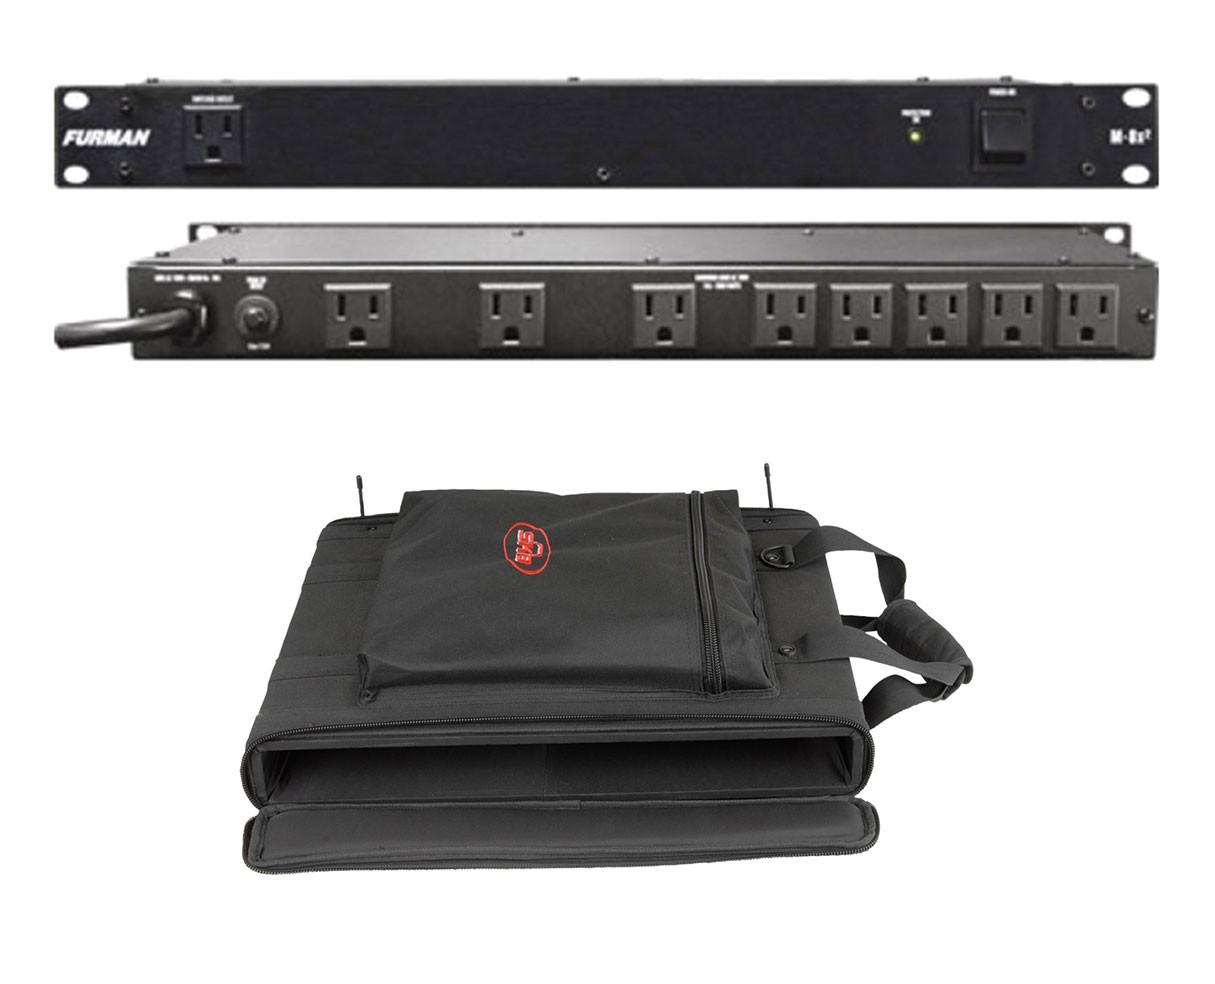 Furman M-8x2 + SKB 1SKB-SC191U